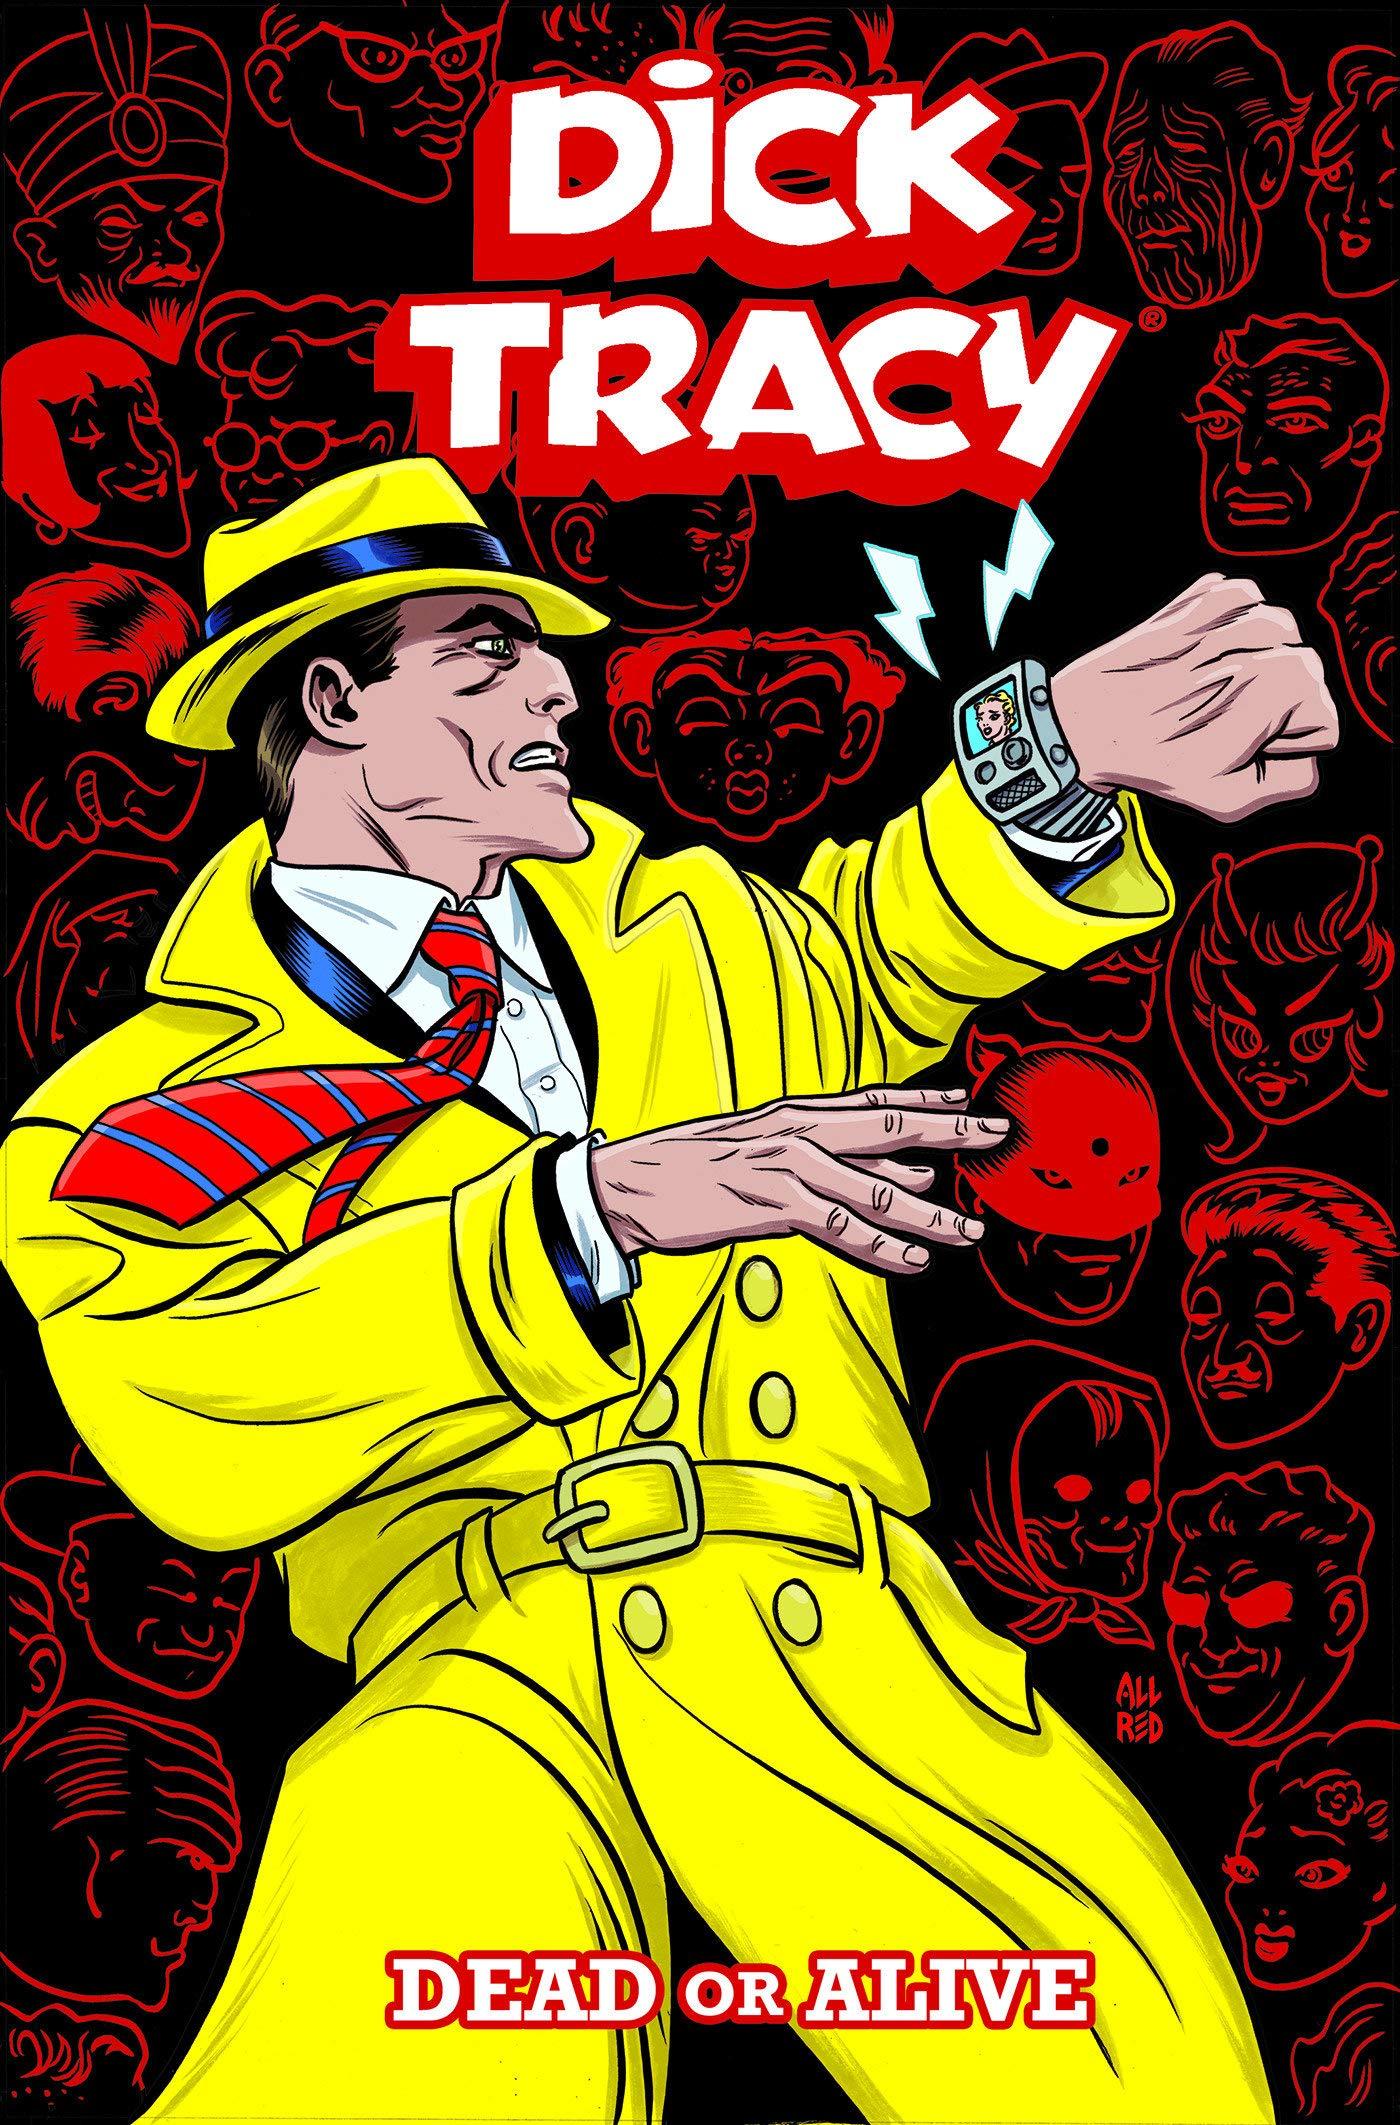 Dick tracy freezer murder